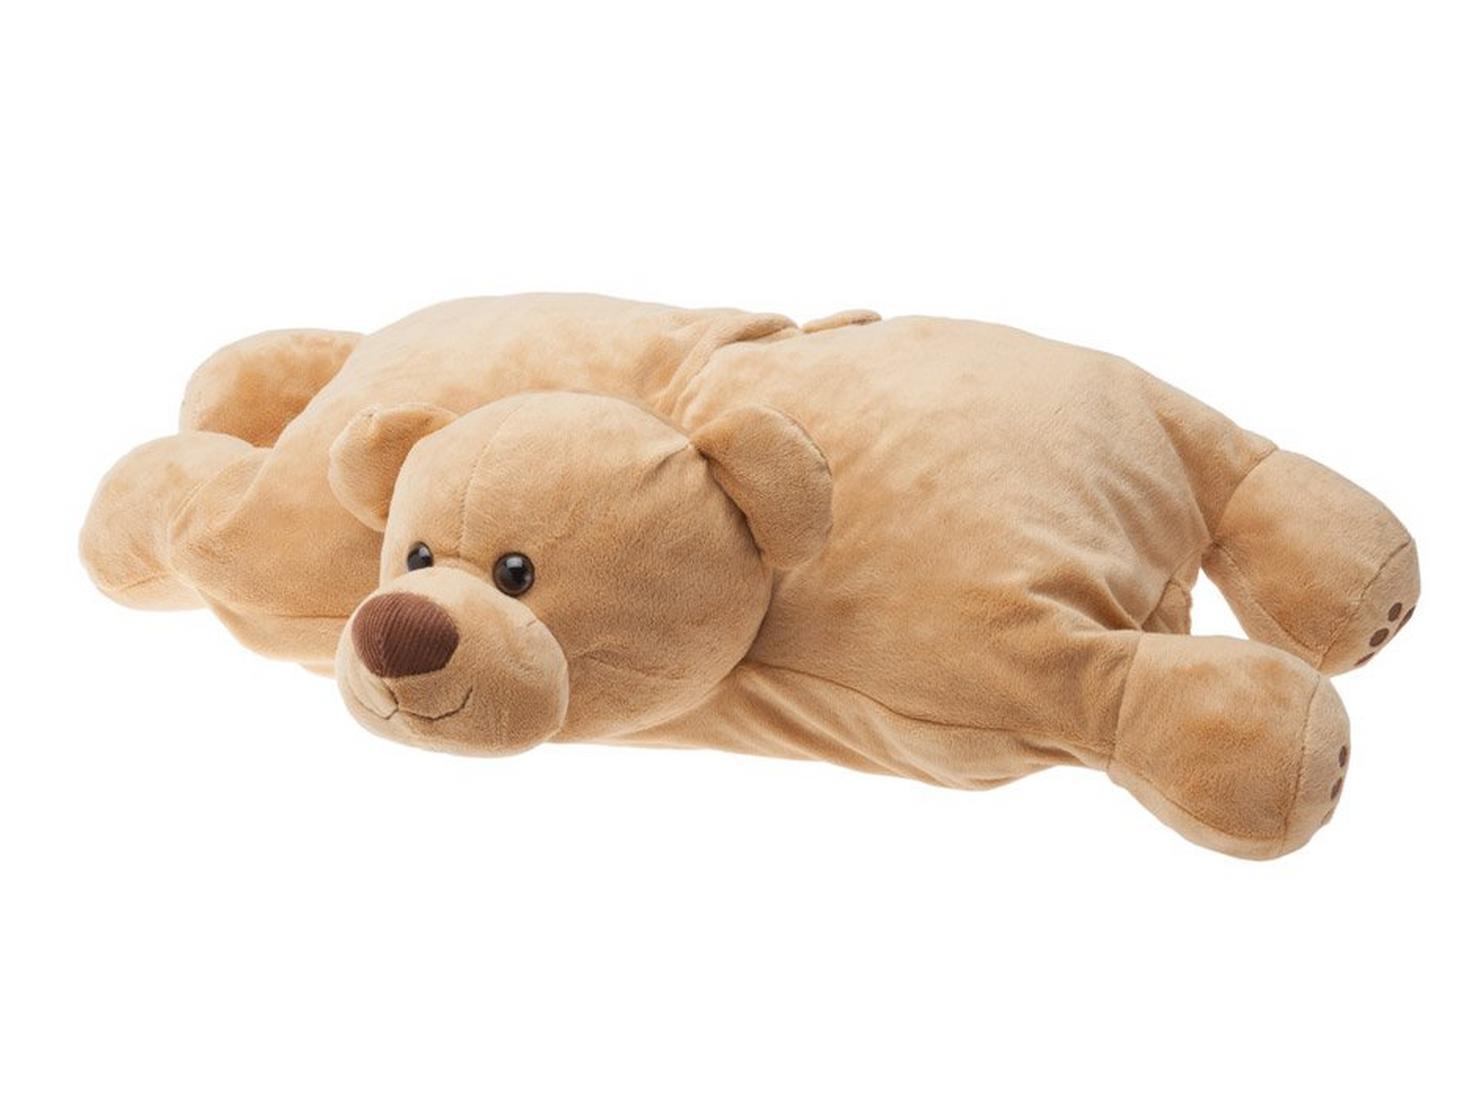 Plush Pillow Bear, Tempur